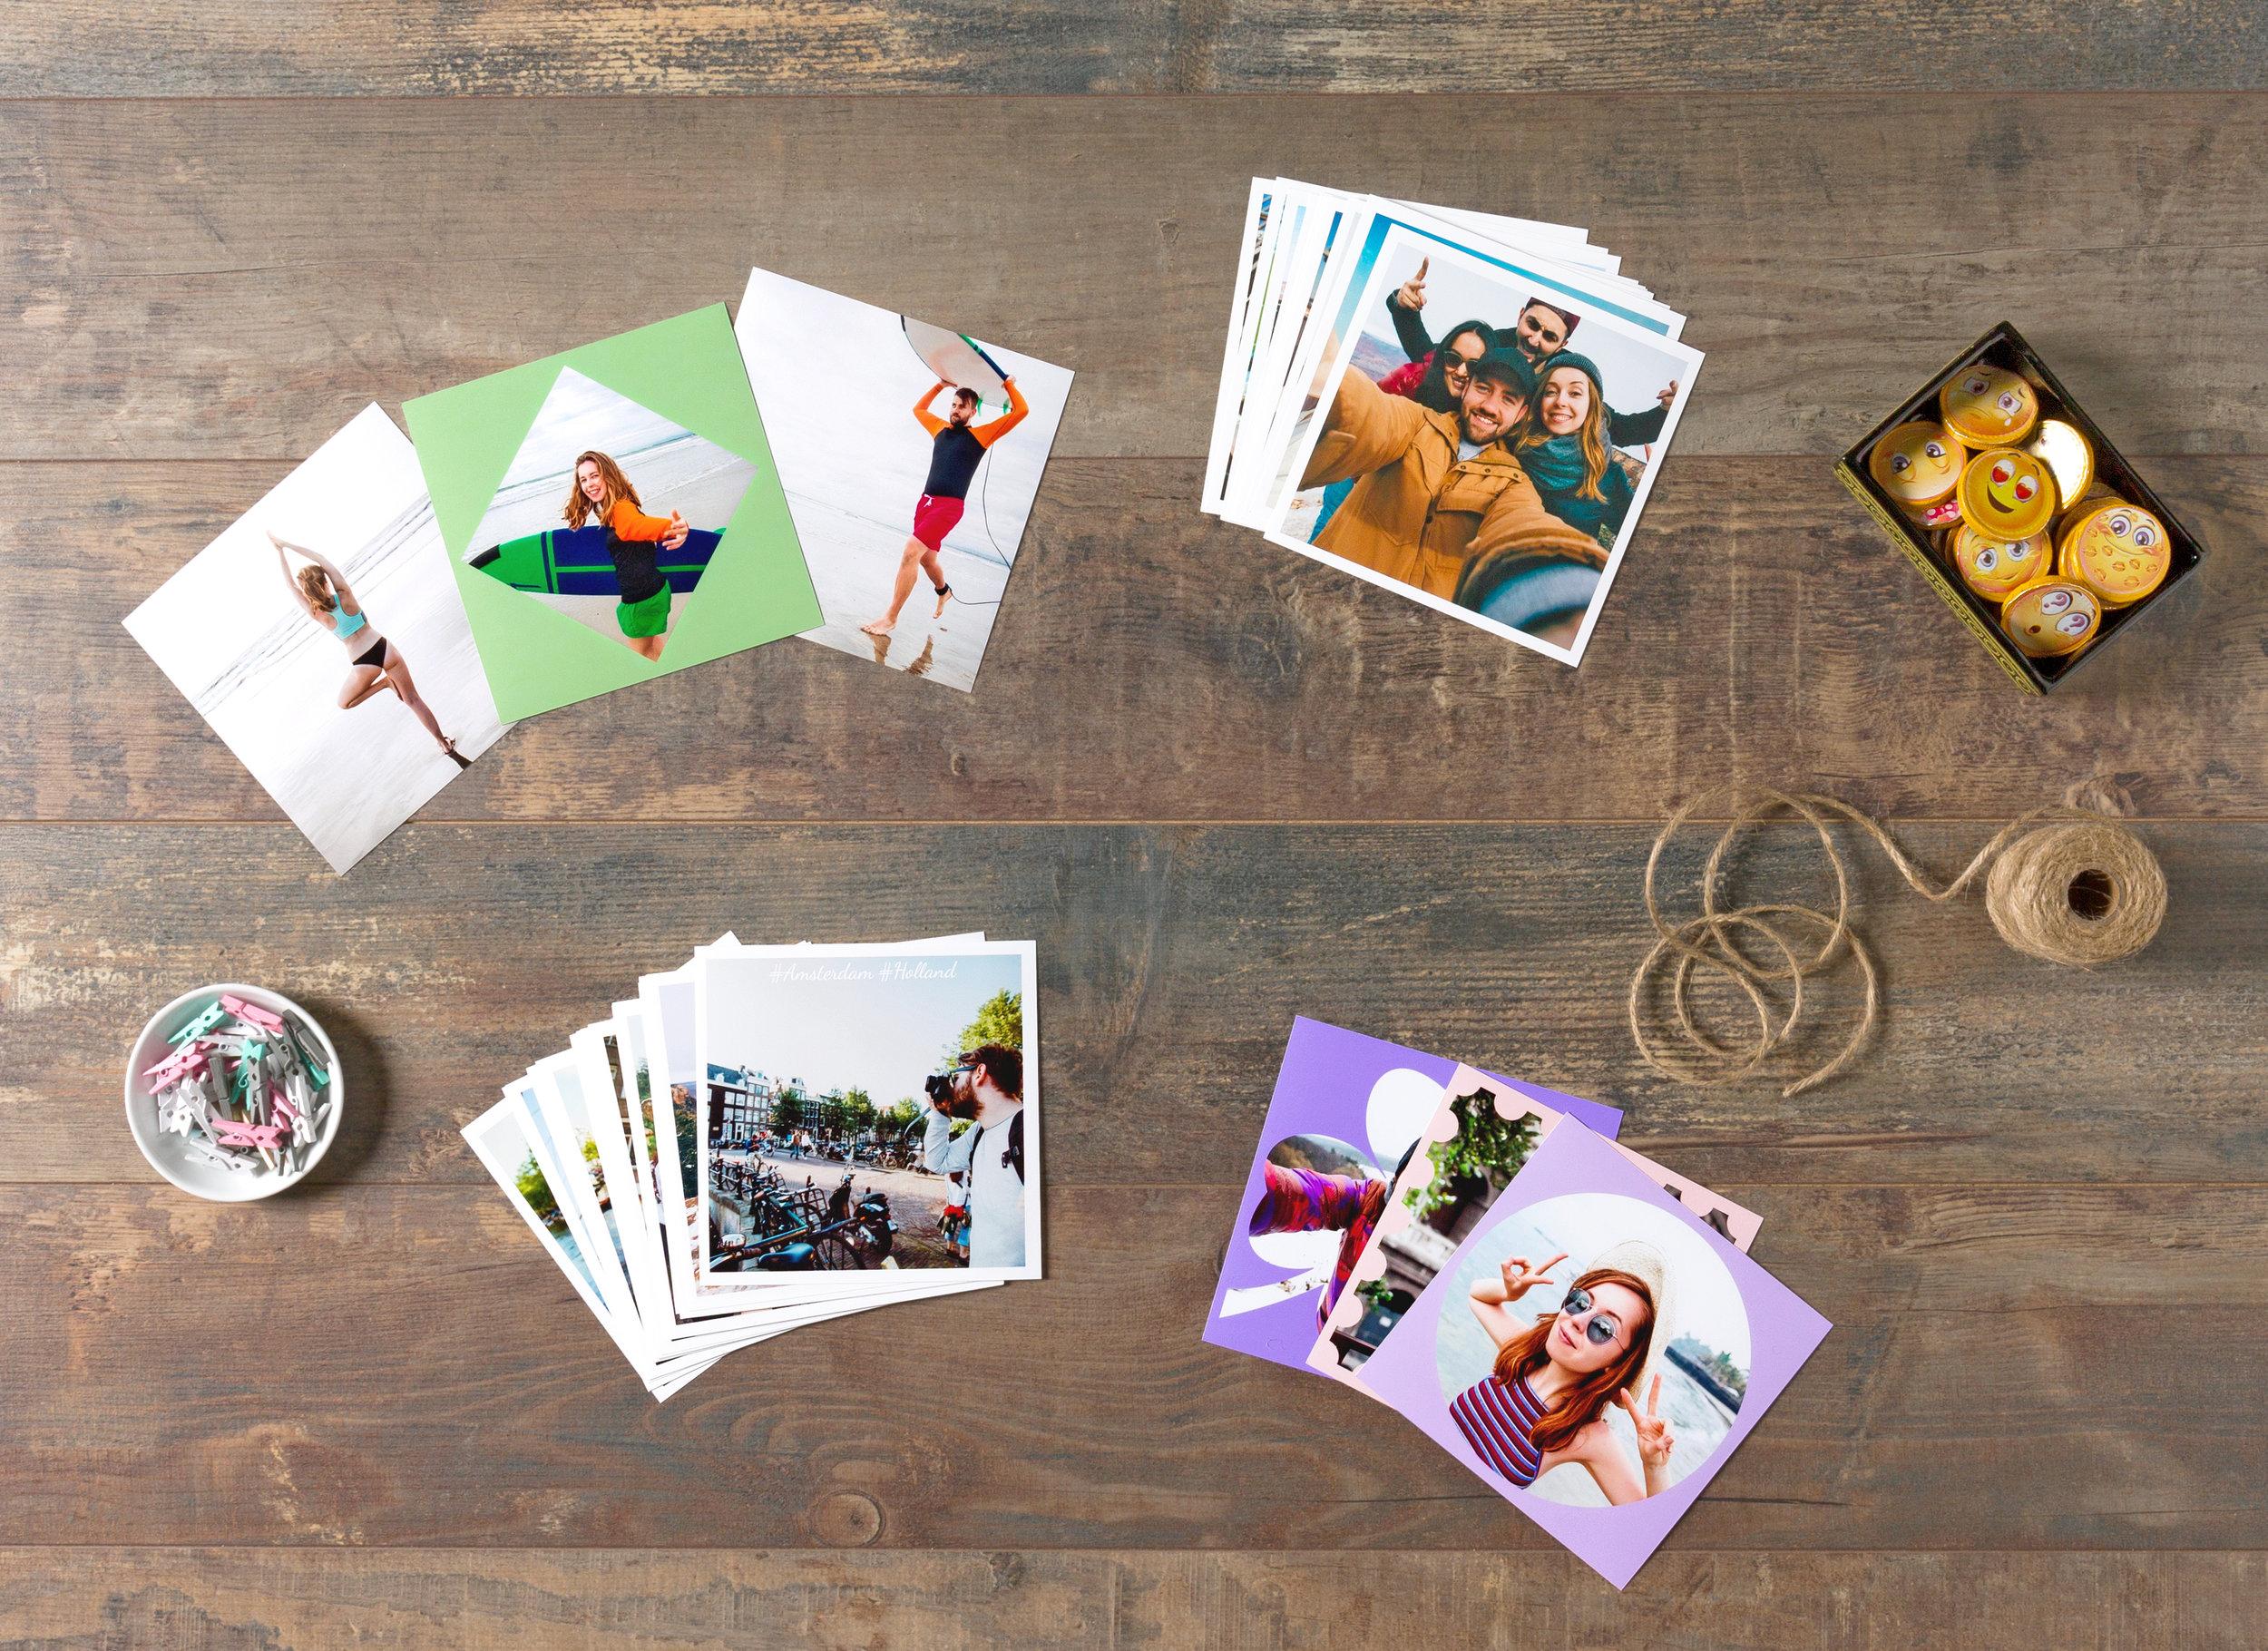 BIG-image-Prints-regular-square-L.jpg